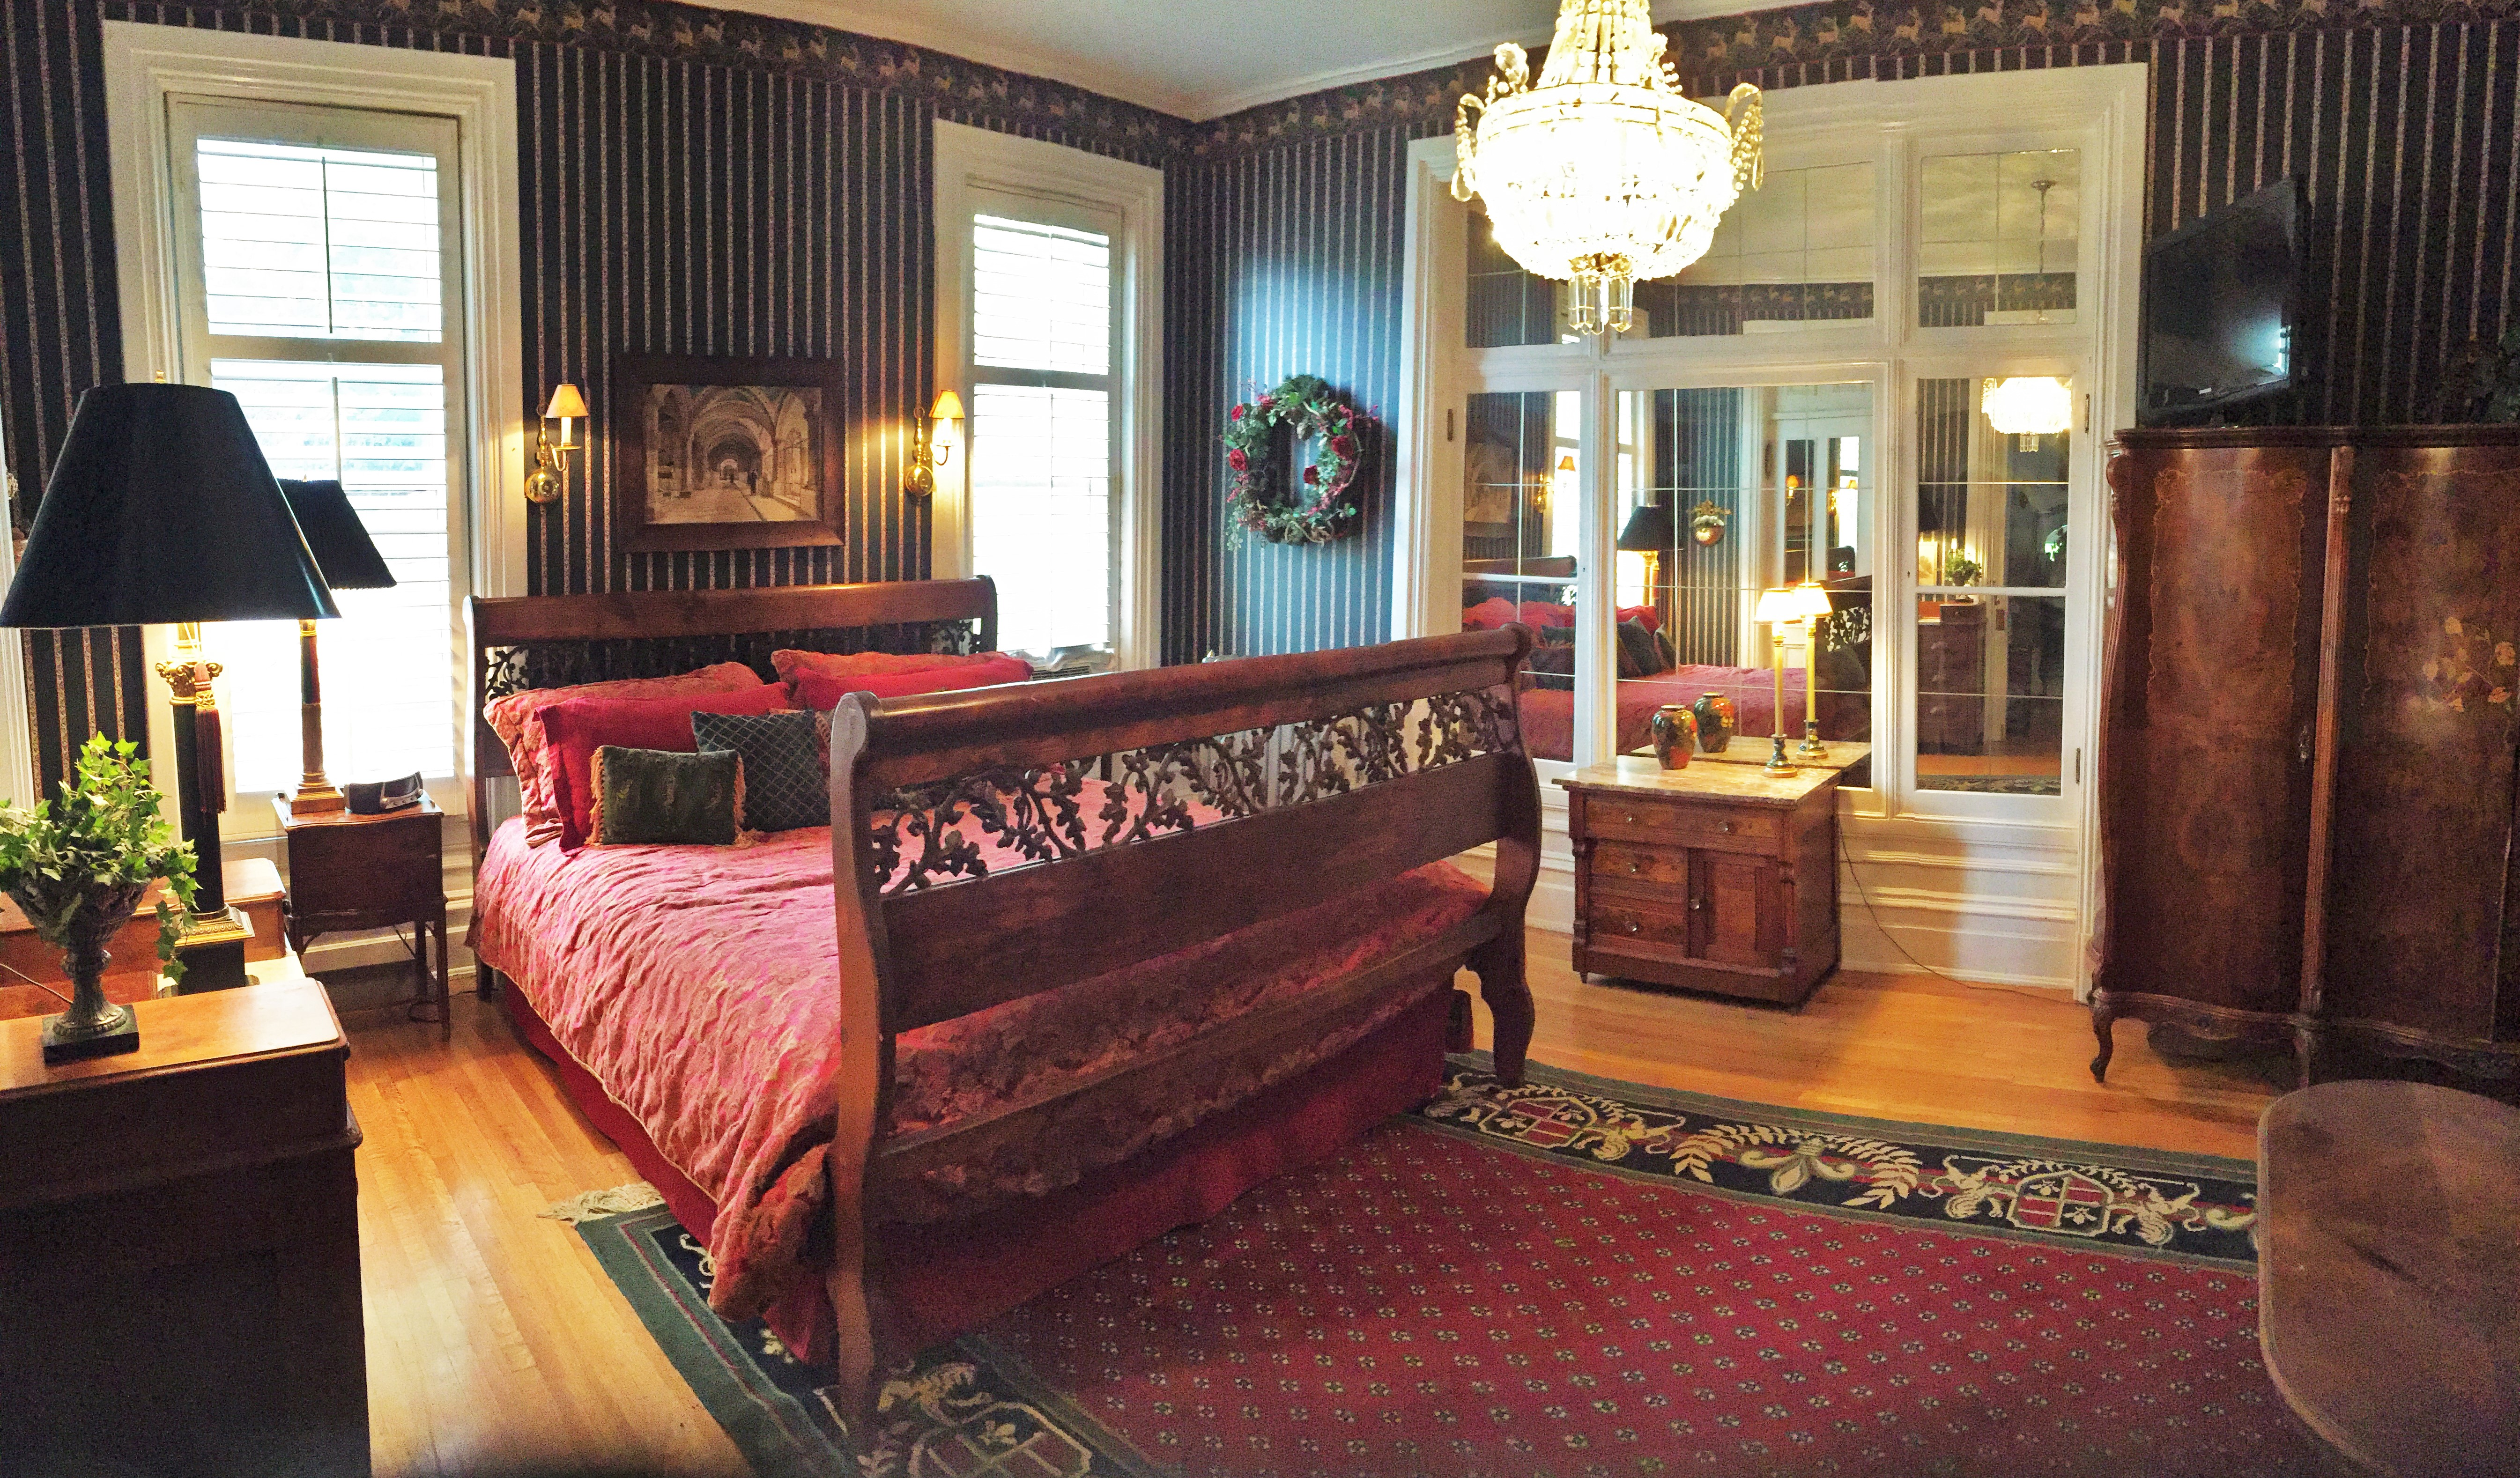 Ellerbeck Mansion Bed U0026 Breakfast   World Traveler Room Vacation Rental In  Salt Lake City